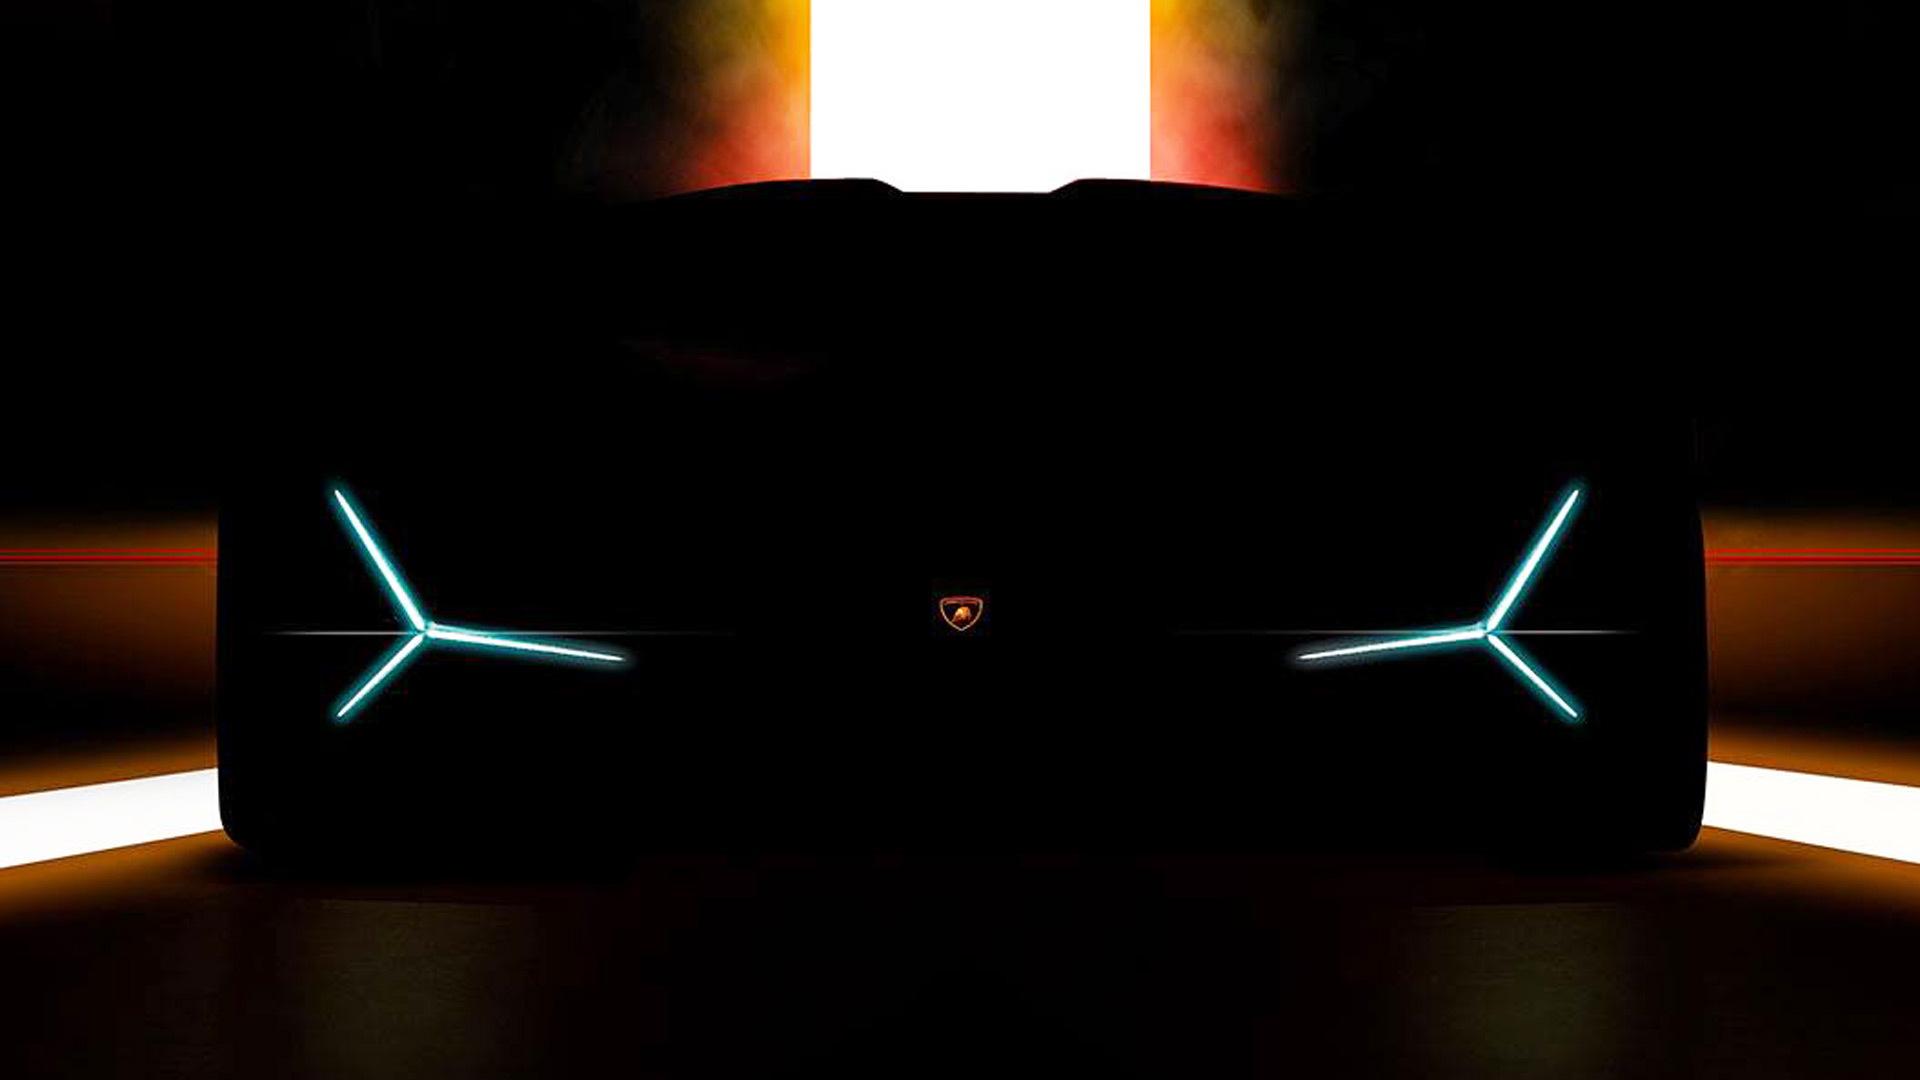 Teaser for new Lamborghini debuting at 2019 Frankfurt auto show